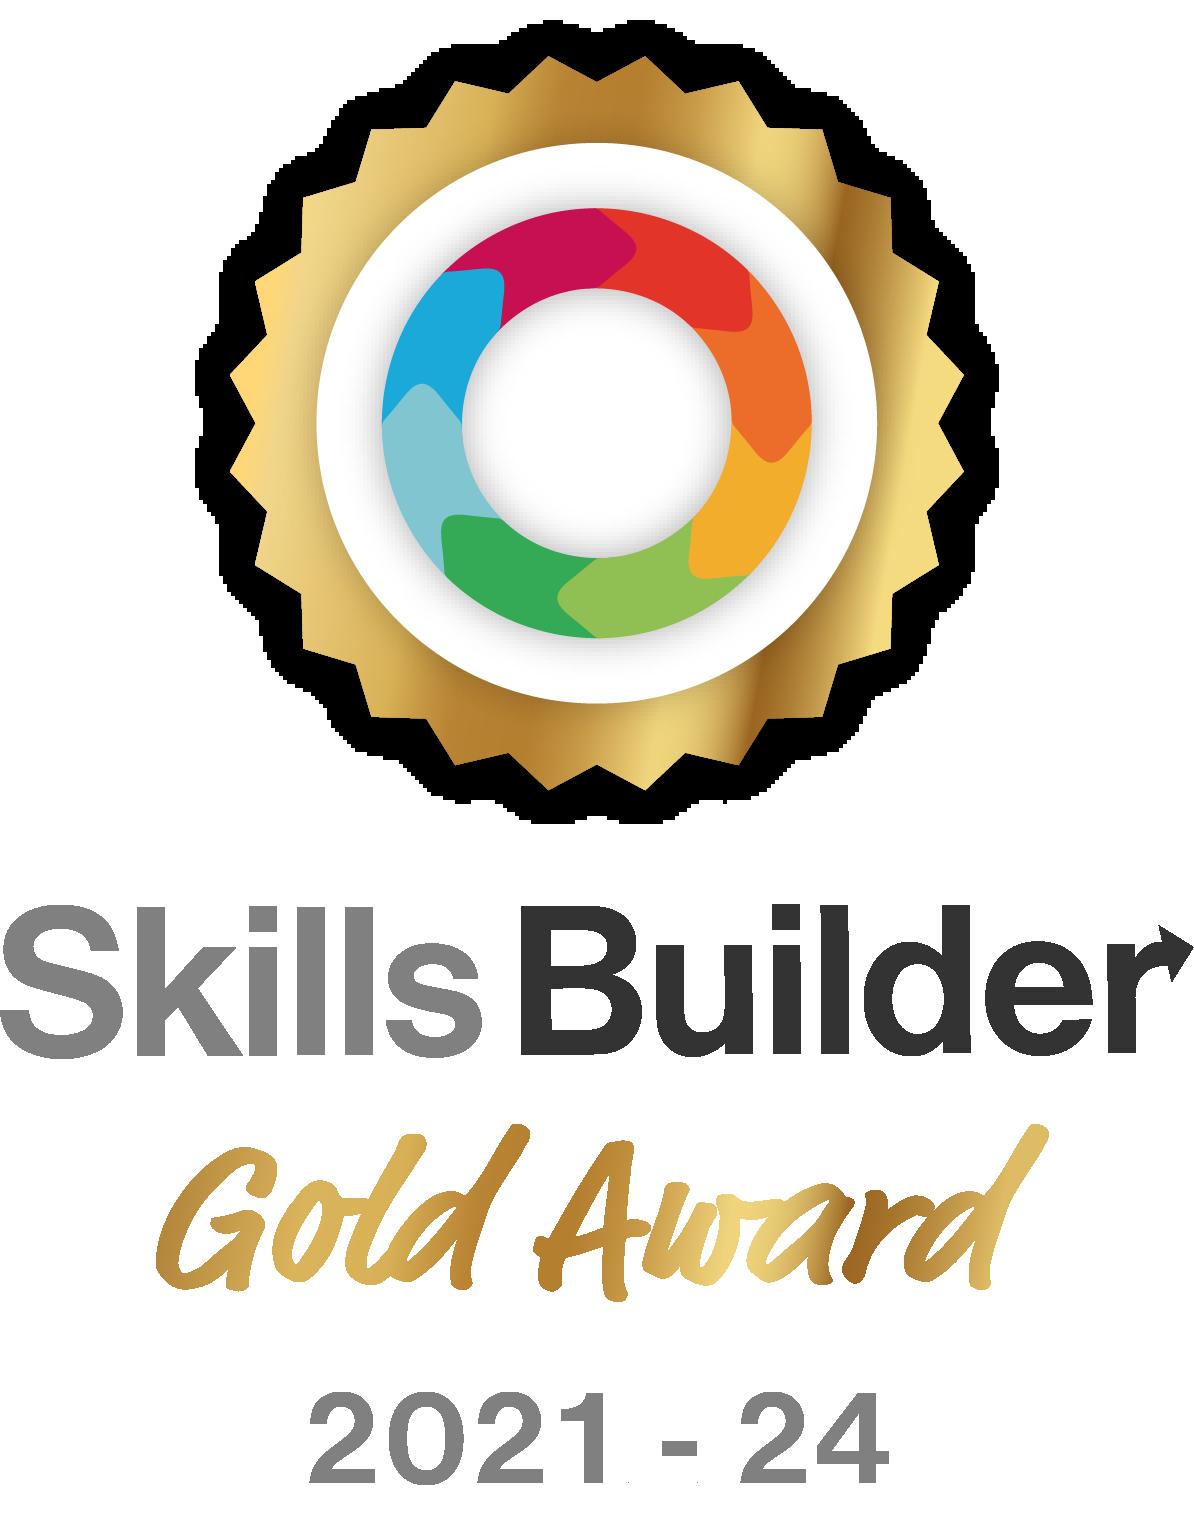 https://stpaulsnuneaton.org.uk/wp-content/uploads/2021/07/Skills-Builder-Gold-Award-2021-24.png